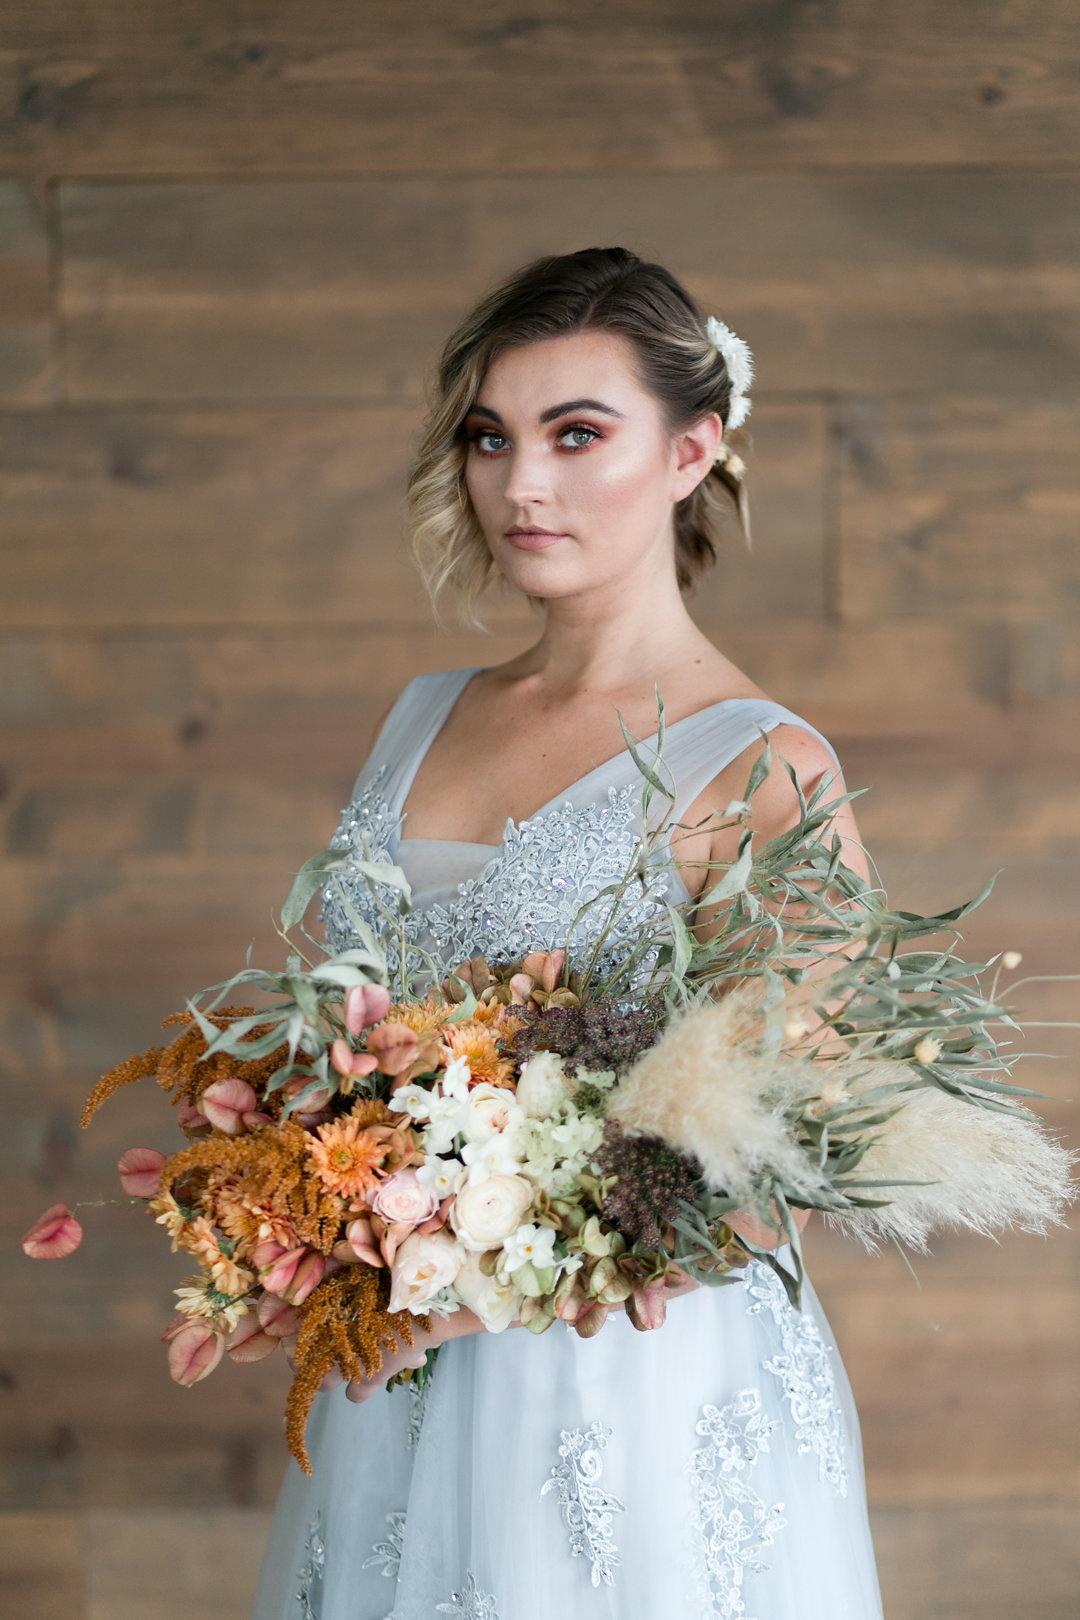 Installation_Florals_Fall_Texture_Sibyl_Sophia_Bouquet.jpg